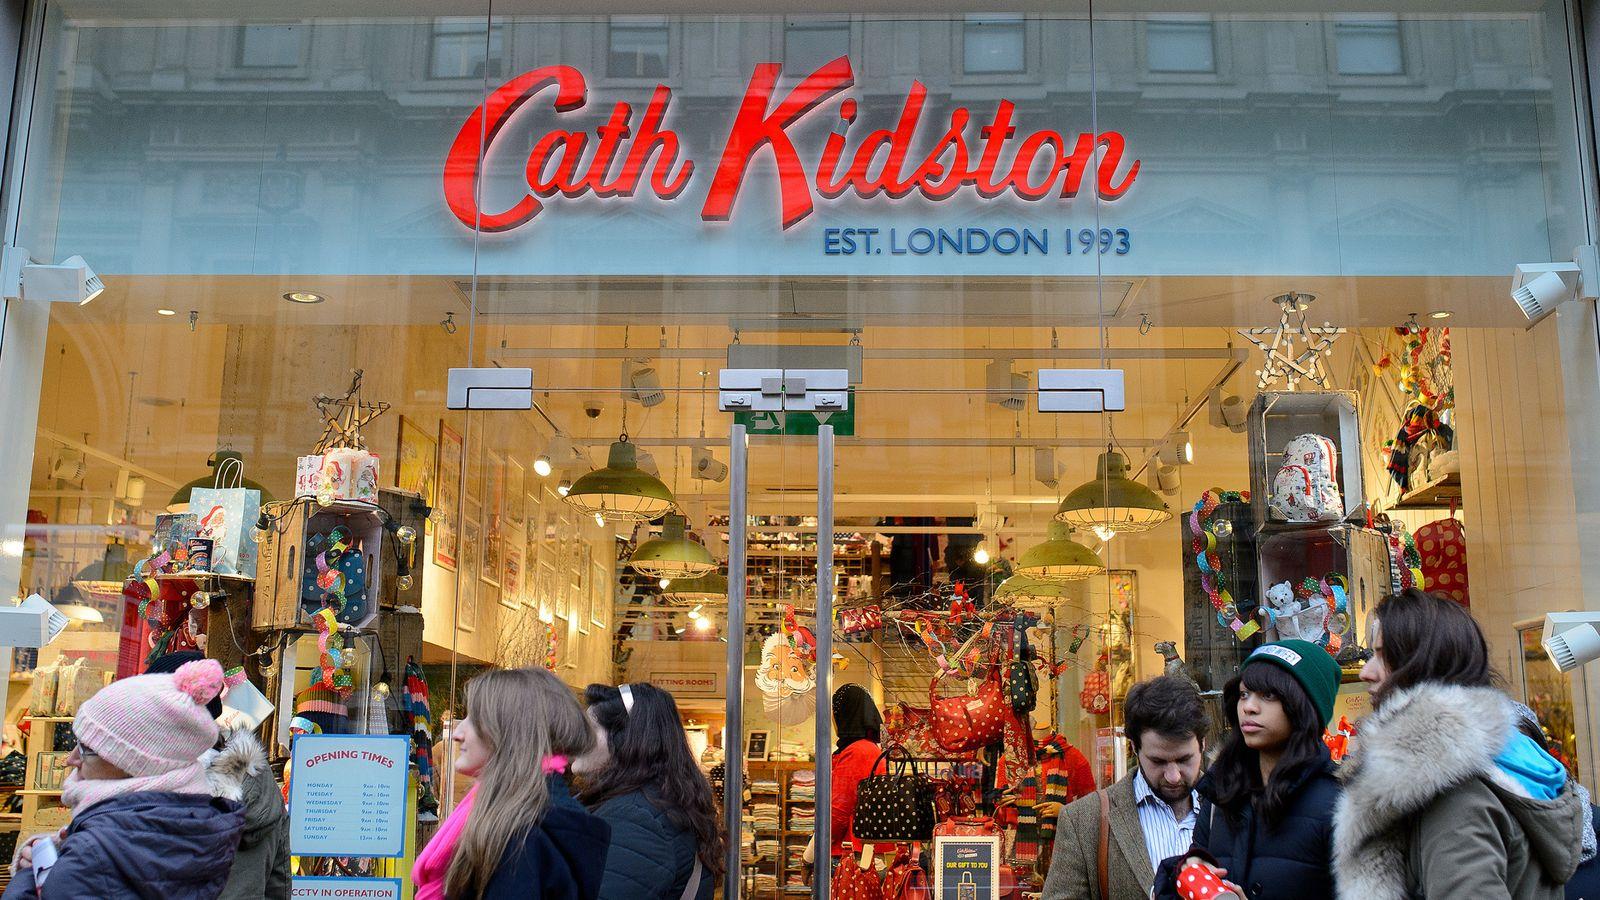 skynews-cath-kidston-london_4952346.jpg?